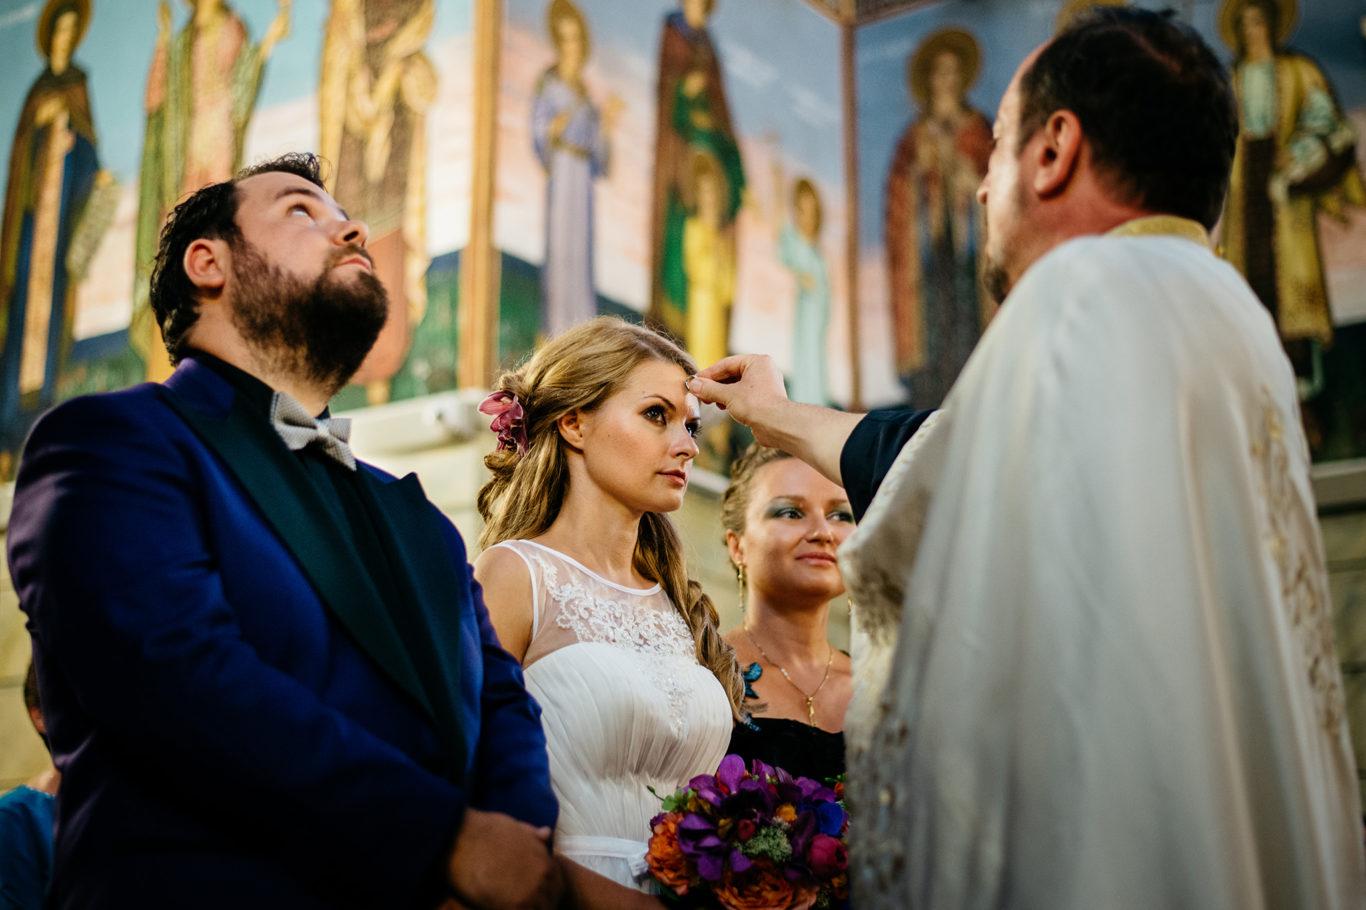 0330-fotografie-nunta-bucuresti-rodica-rares-fotograf-ciprian-dumitrescu-dsc_2548